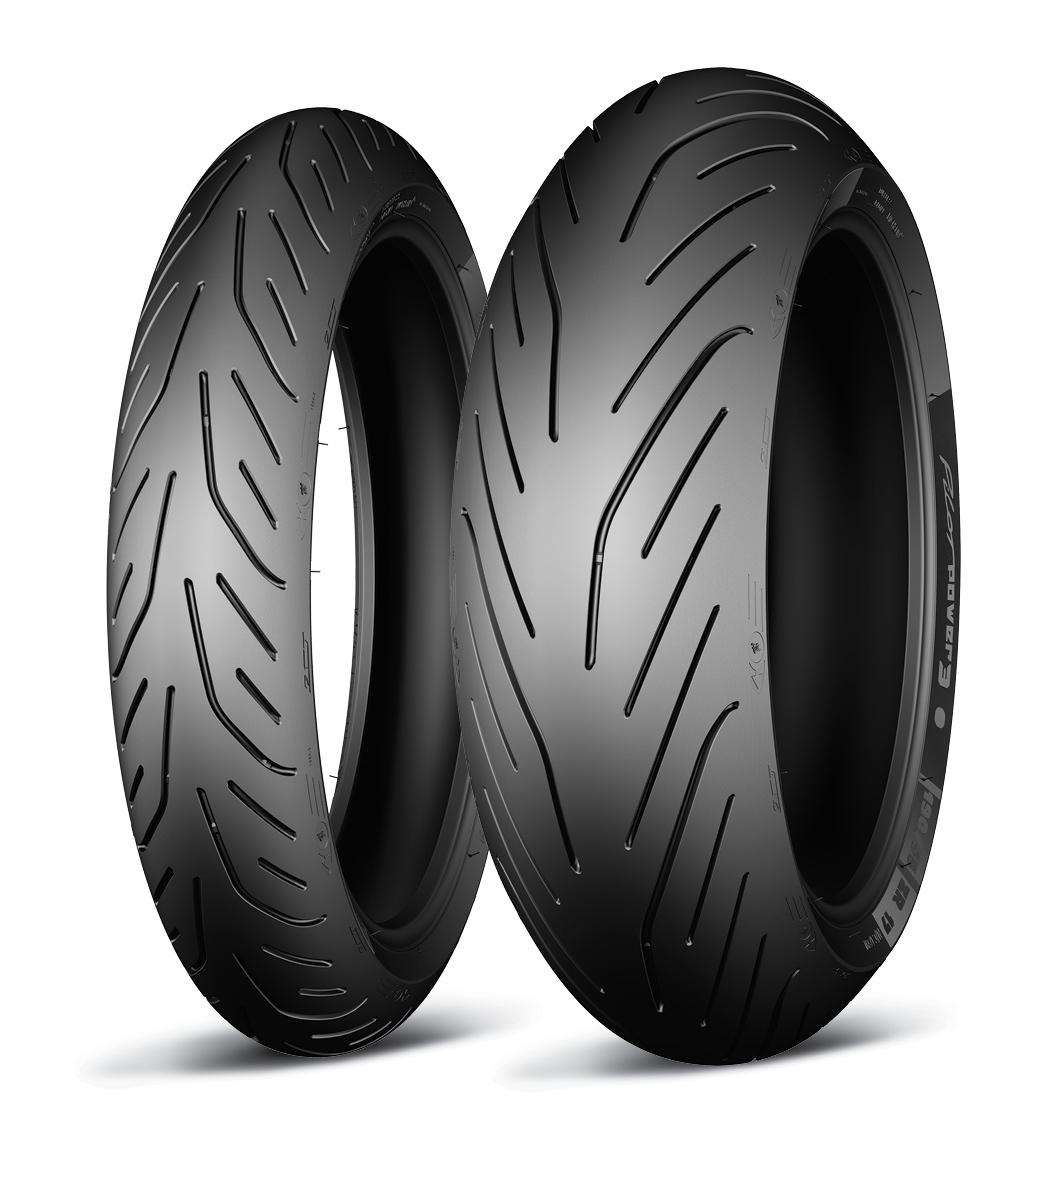 Michelin Pilot Power 3 - Motociklu riepas